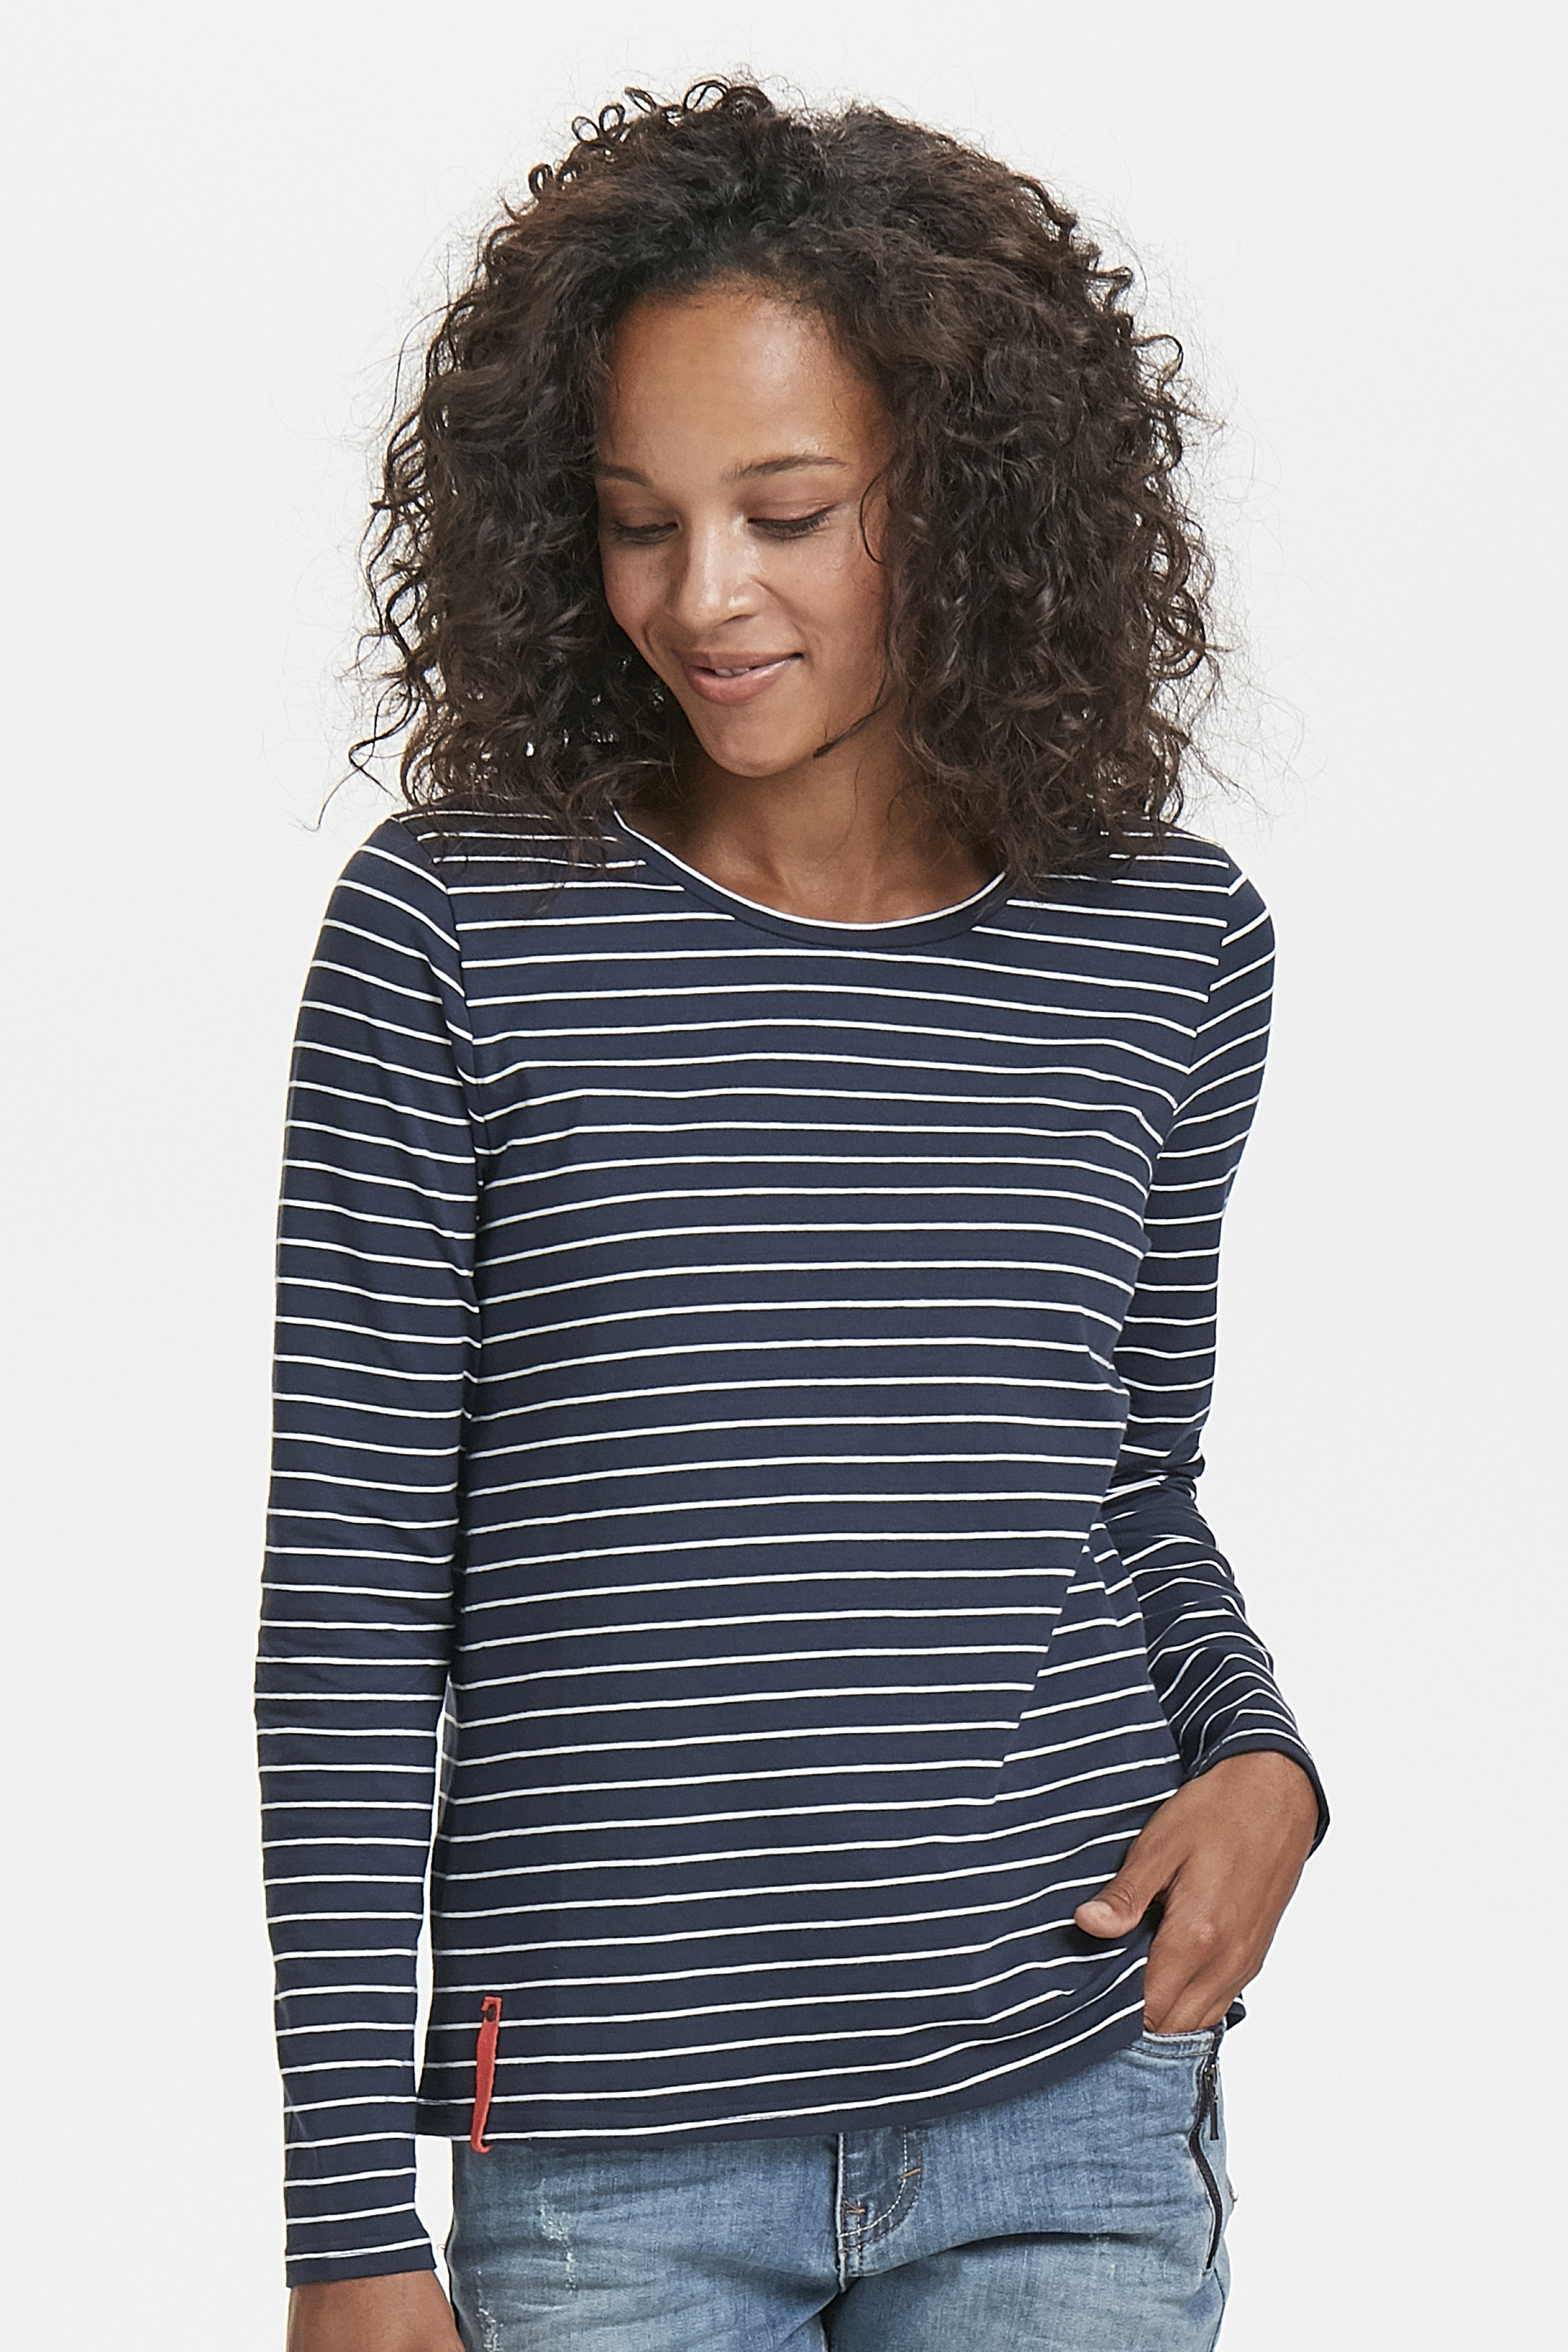 Marineblå/off-white Langærmet T-shirt fra Bon'A Parte – Køb Marineblå/off-white Langærmet T-shirt fra str. S-2XL her